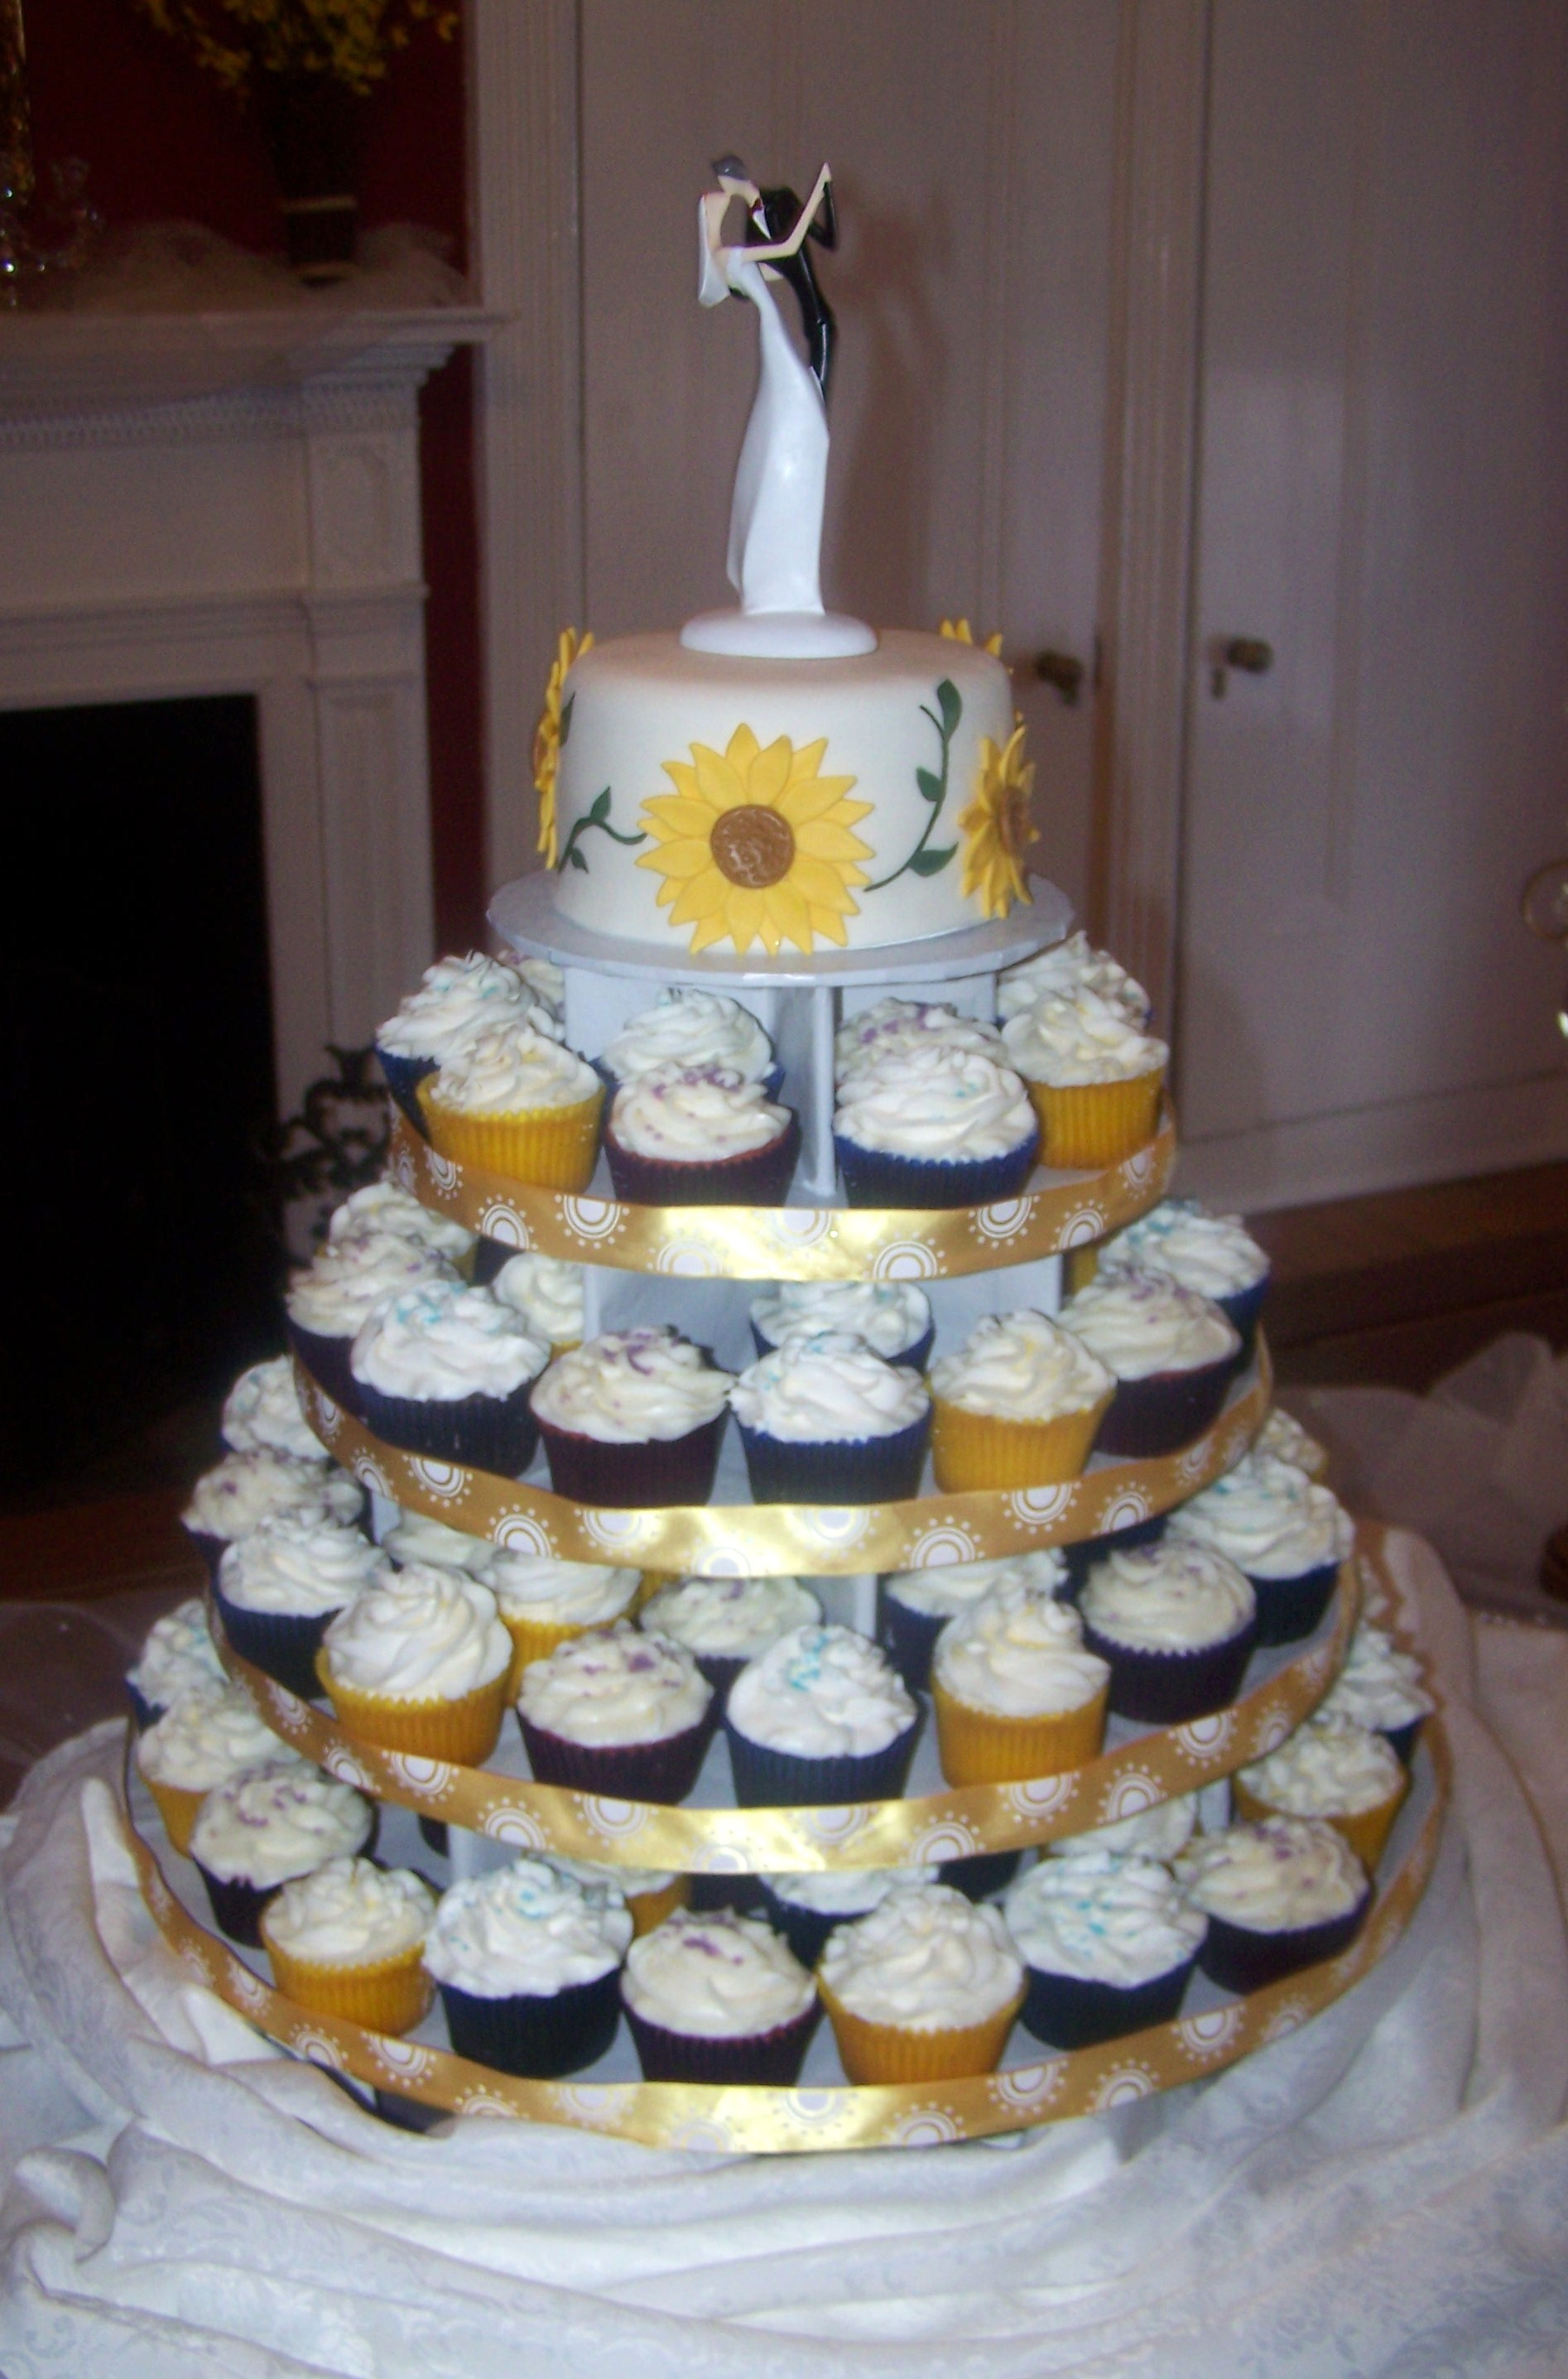 Wedding Cake Cupcakes  Wedding Cakes & Groom's Cakes Beth Ann s